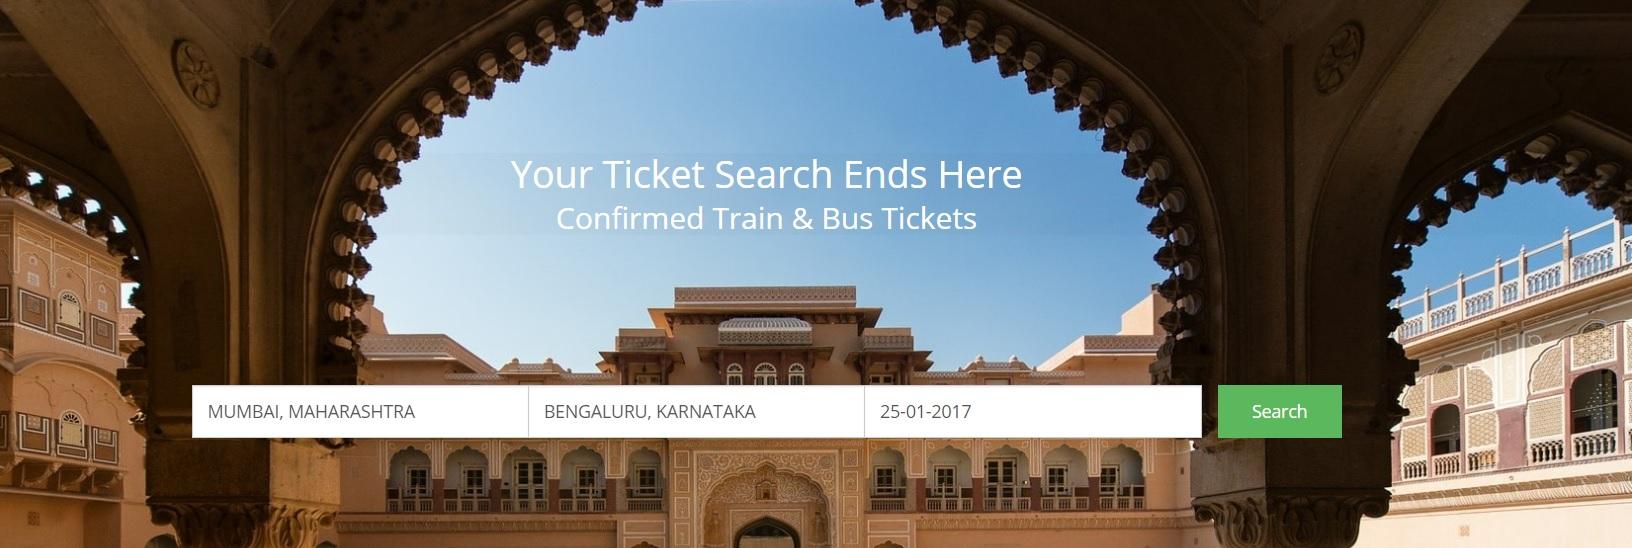 IRCTC Train Ticket booking Online - Confirm Ticket Trains